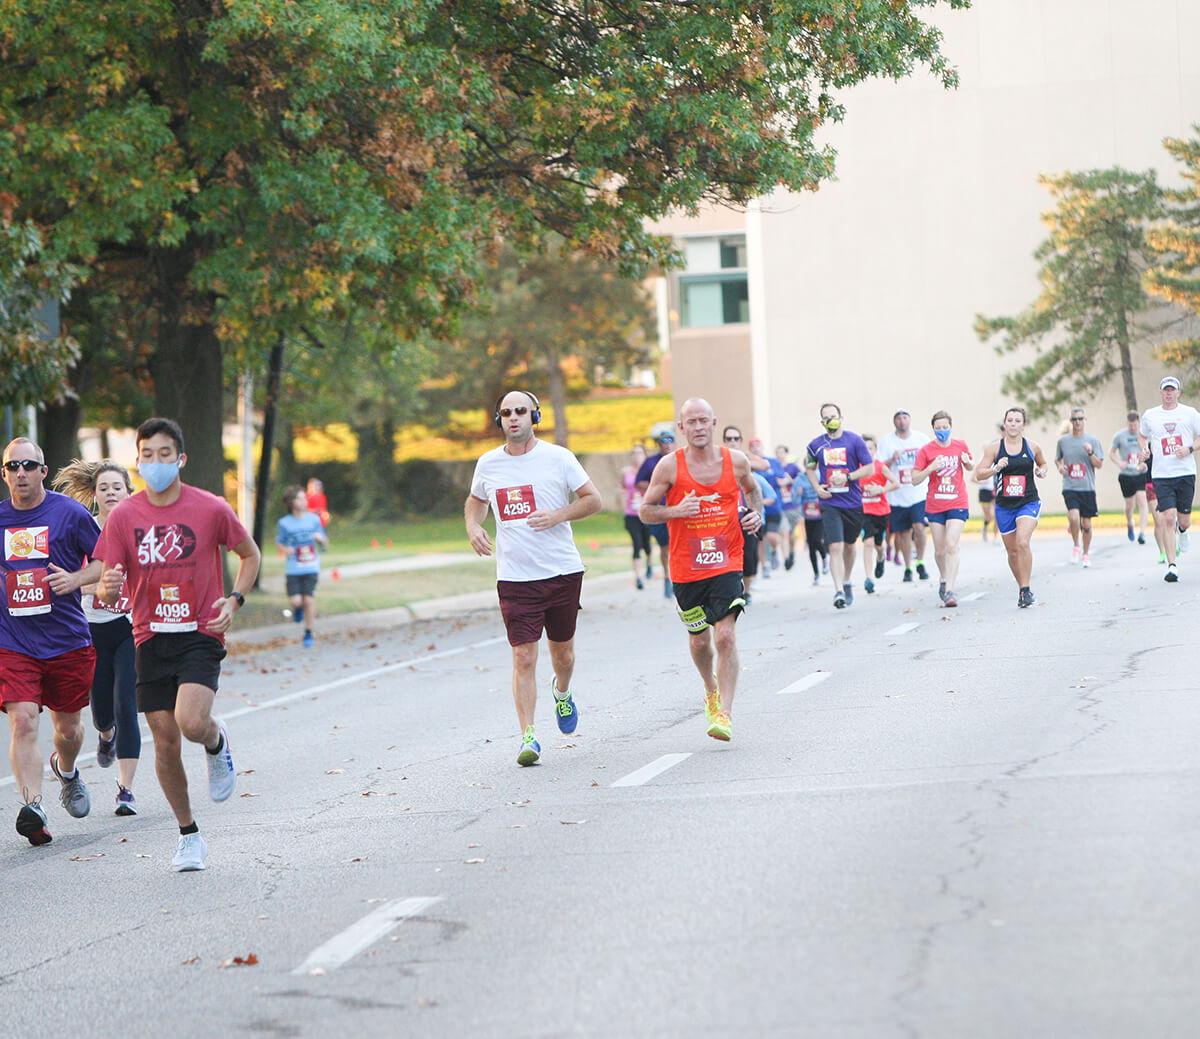 The Prairie Fire Marathon Spring Race Start/Finish will be at 455 S. Wichita St, Wichita, KS 67202.